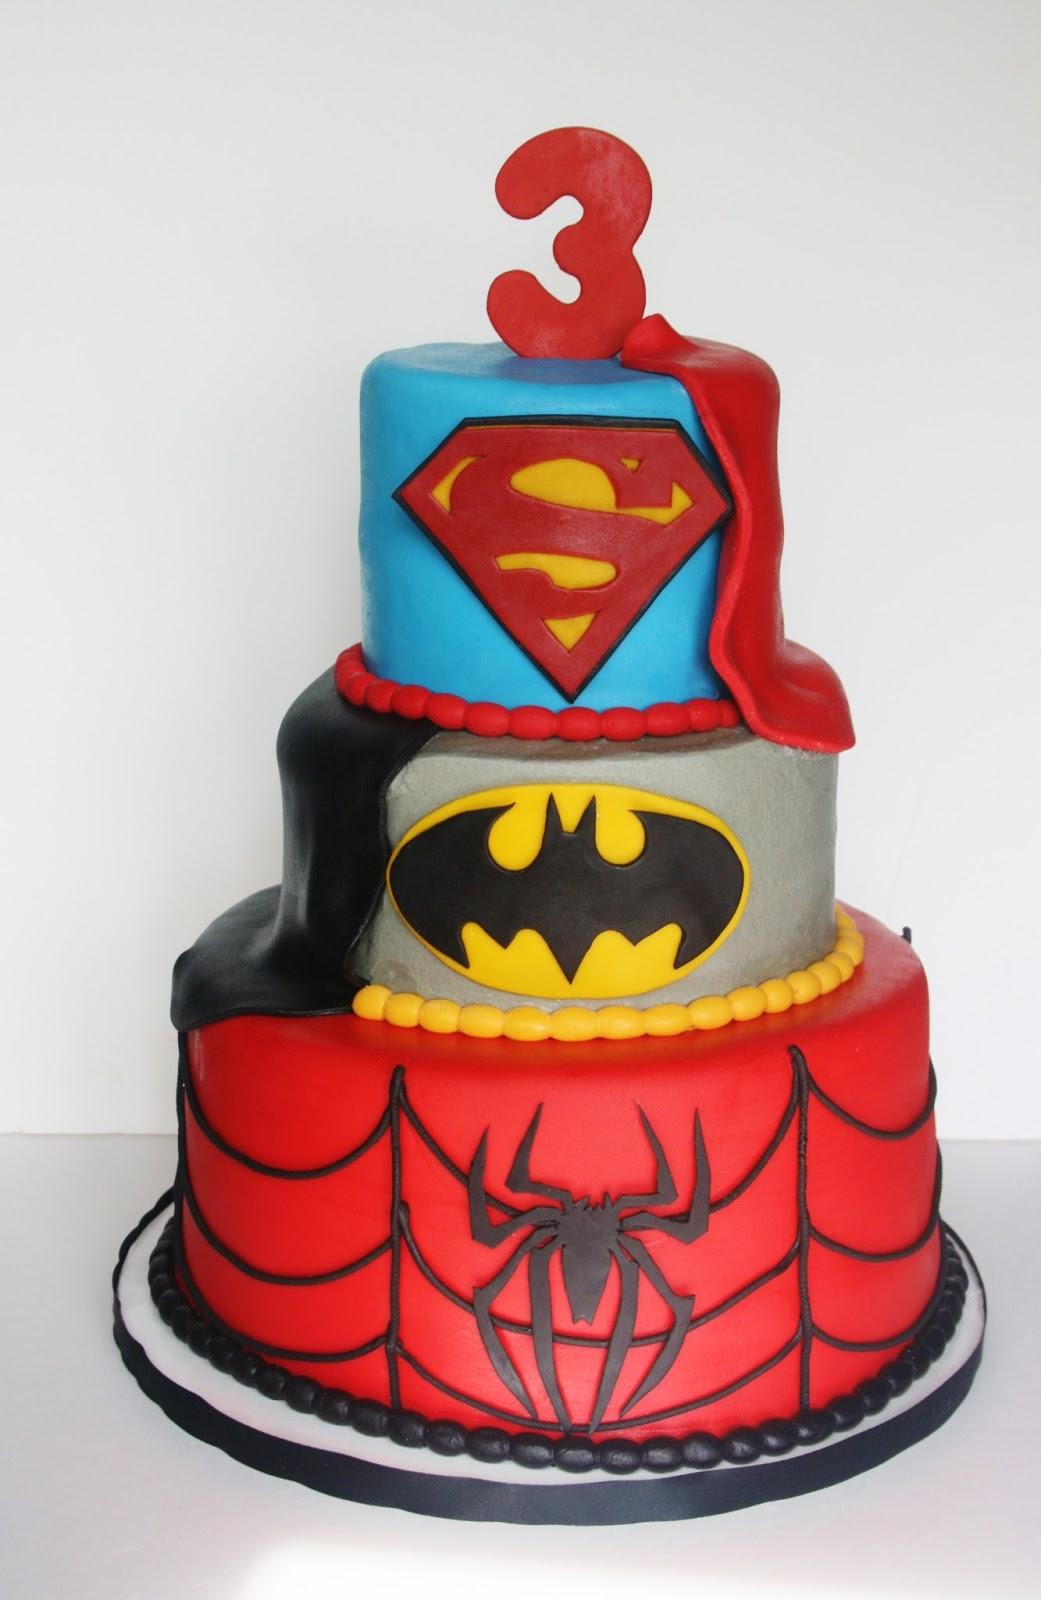 Superheroes - Louise Jackson Cake Design |Superhero Cakes